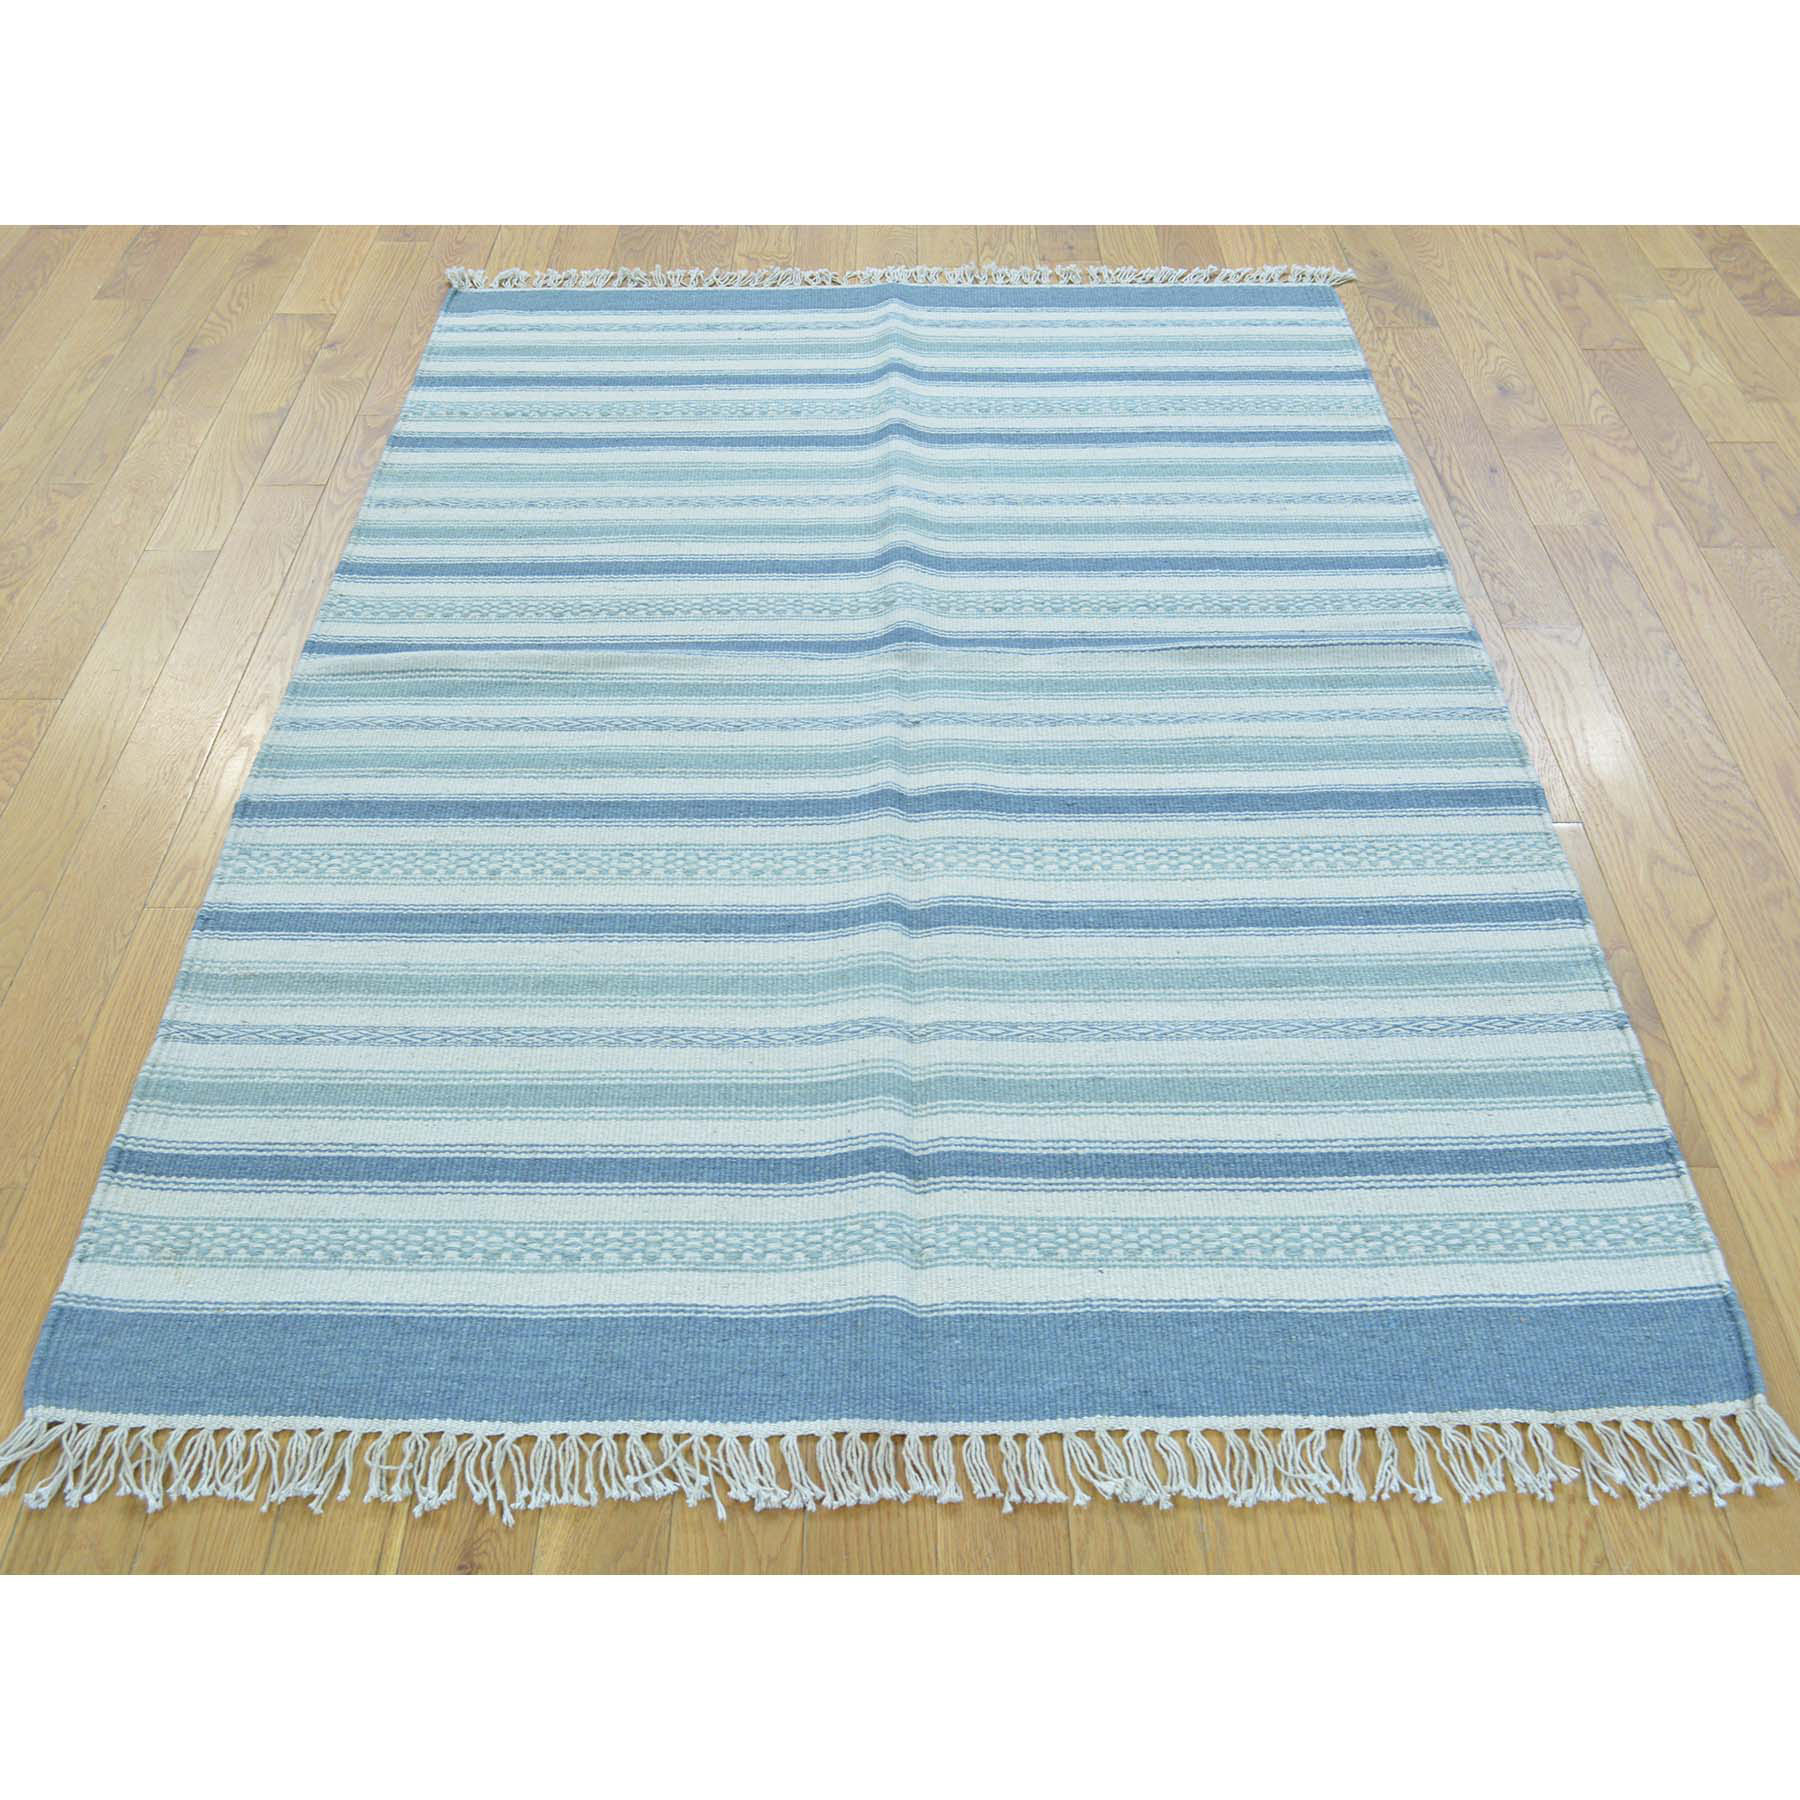 3-10 x5-9  Hand Woven Pure Wool Striped Flat Weave Kilim Oriental Rug